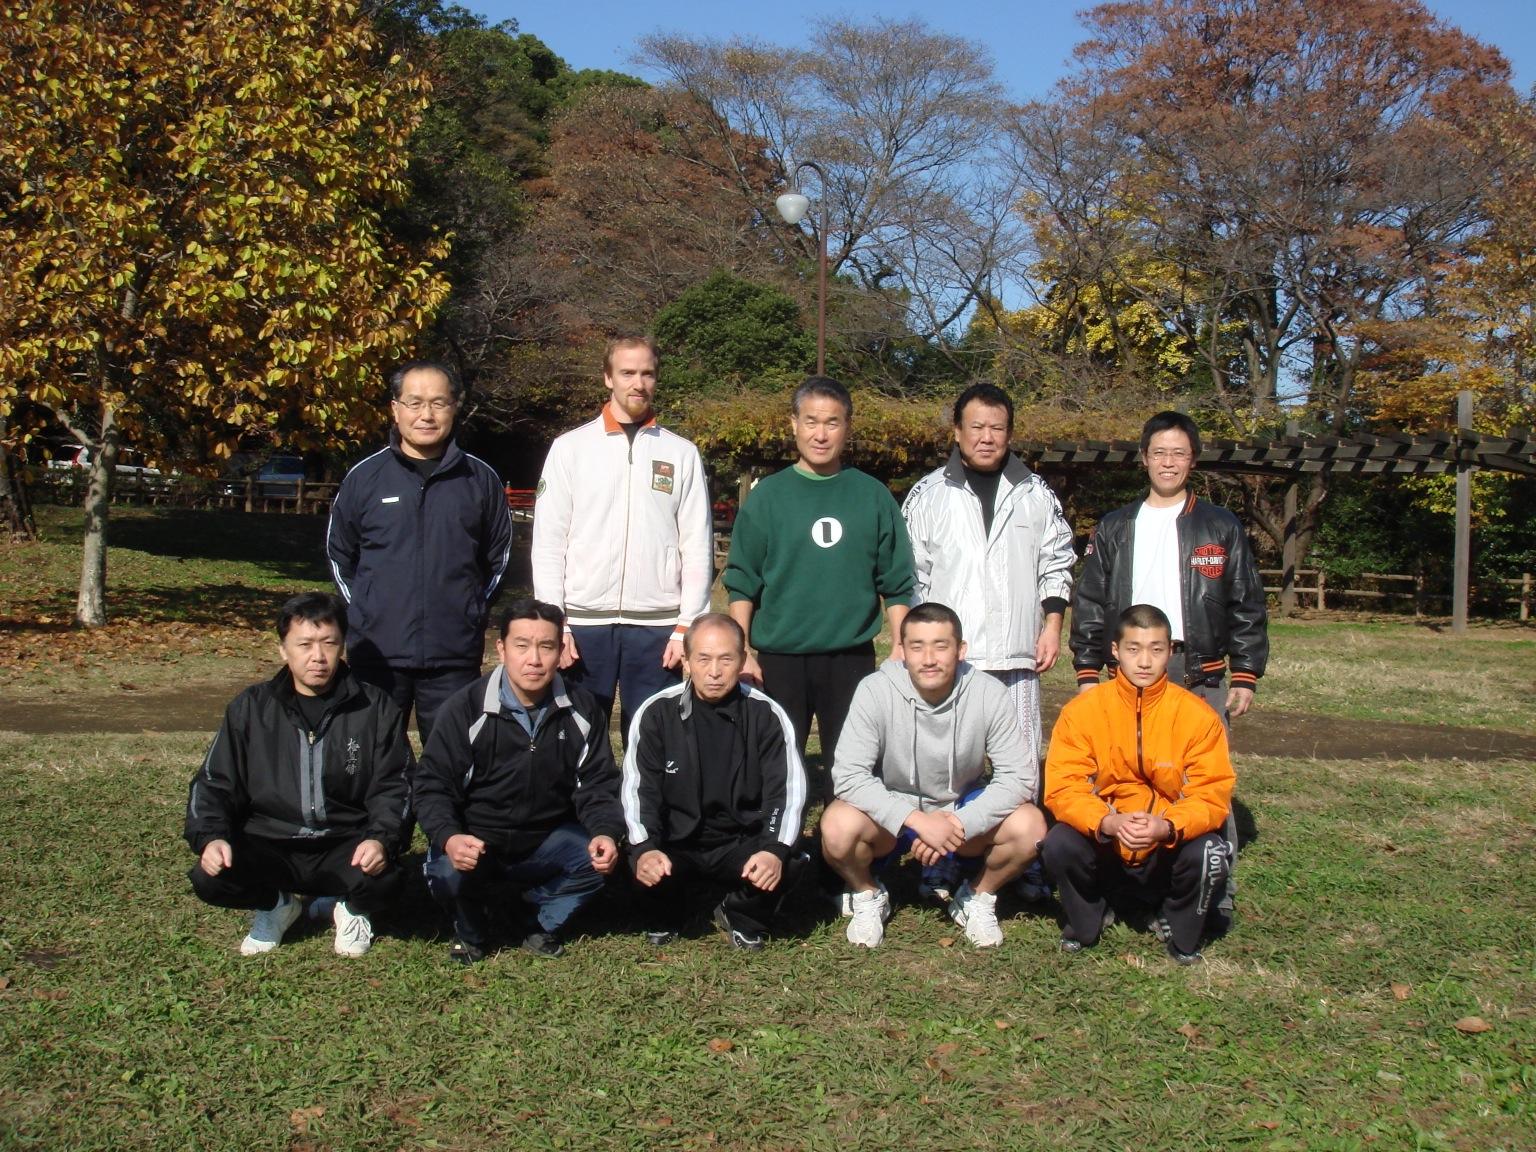 Akiyama, Kristian Gomez Gunnebring, Hatsuo Royama, Sakurai, Kataoka, Horigome, Hayasaka, Enami Takaai, Kataoka, Horigome, Hayasaka, Kim and Lee